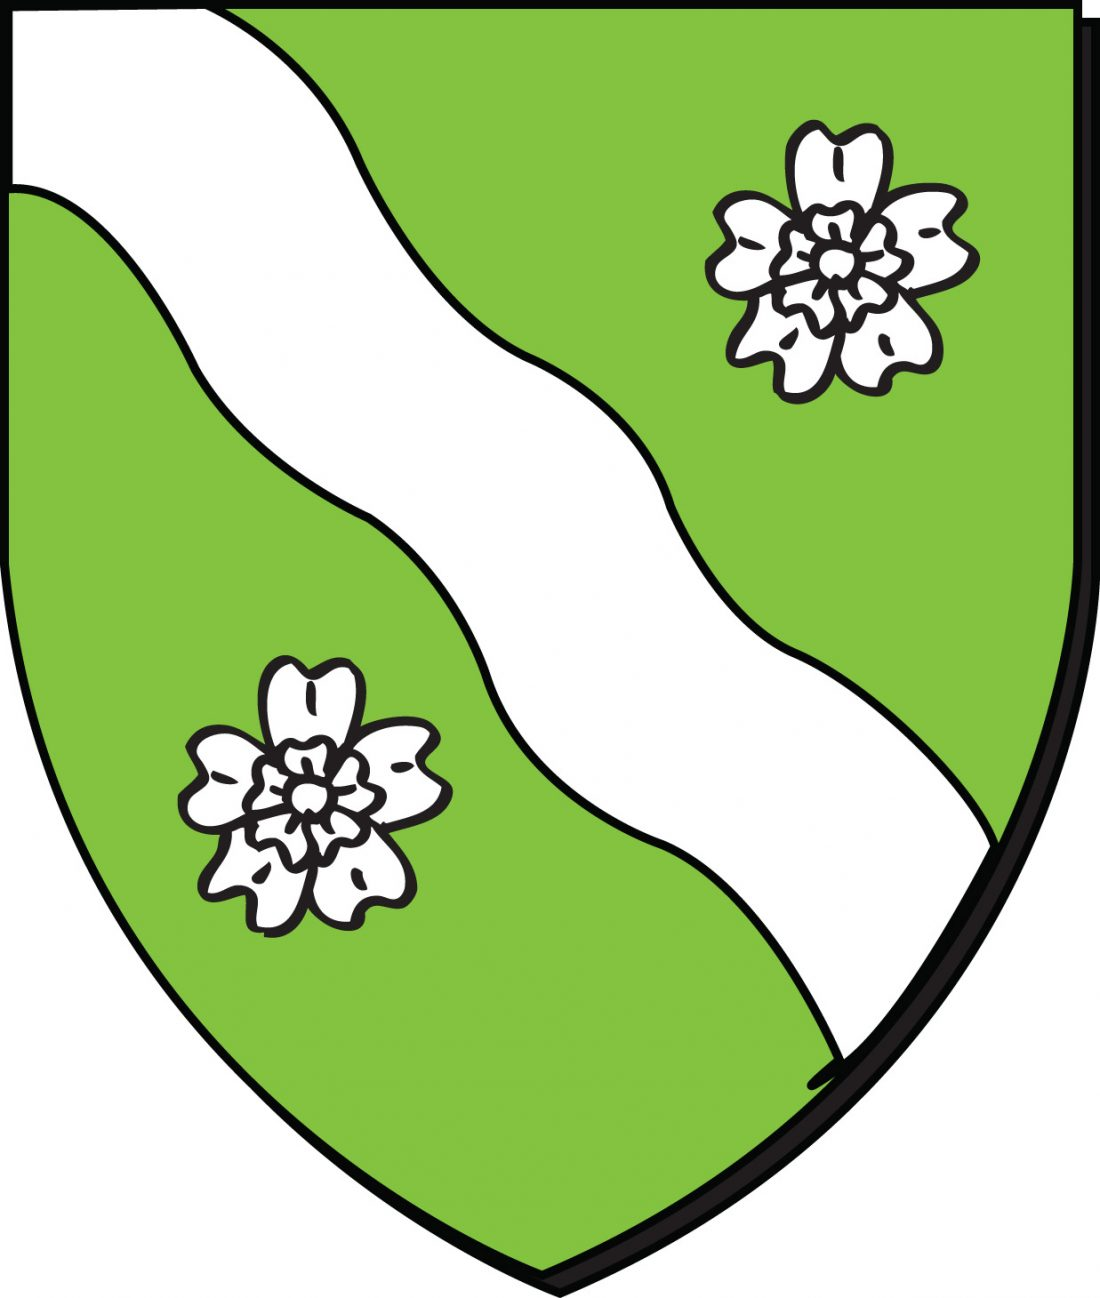 Les armoiries de la ville de Schaerbeek en Belgique